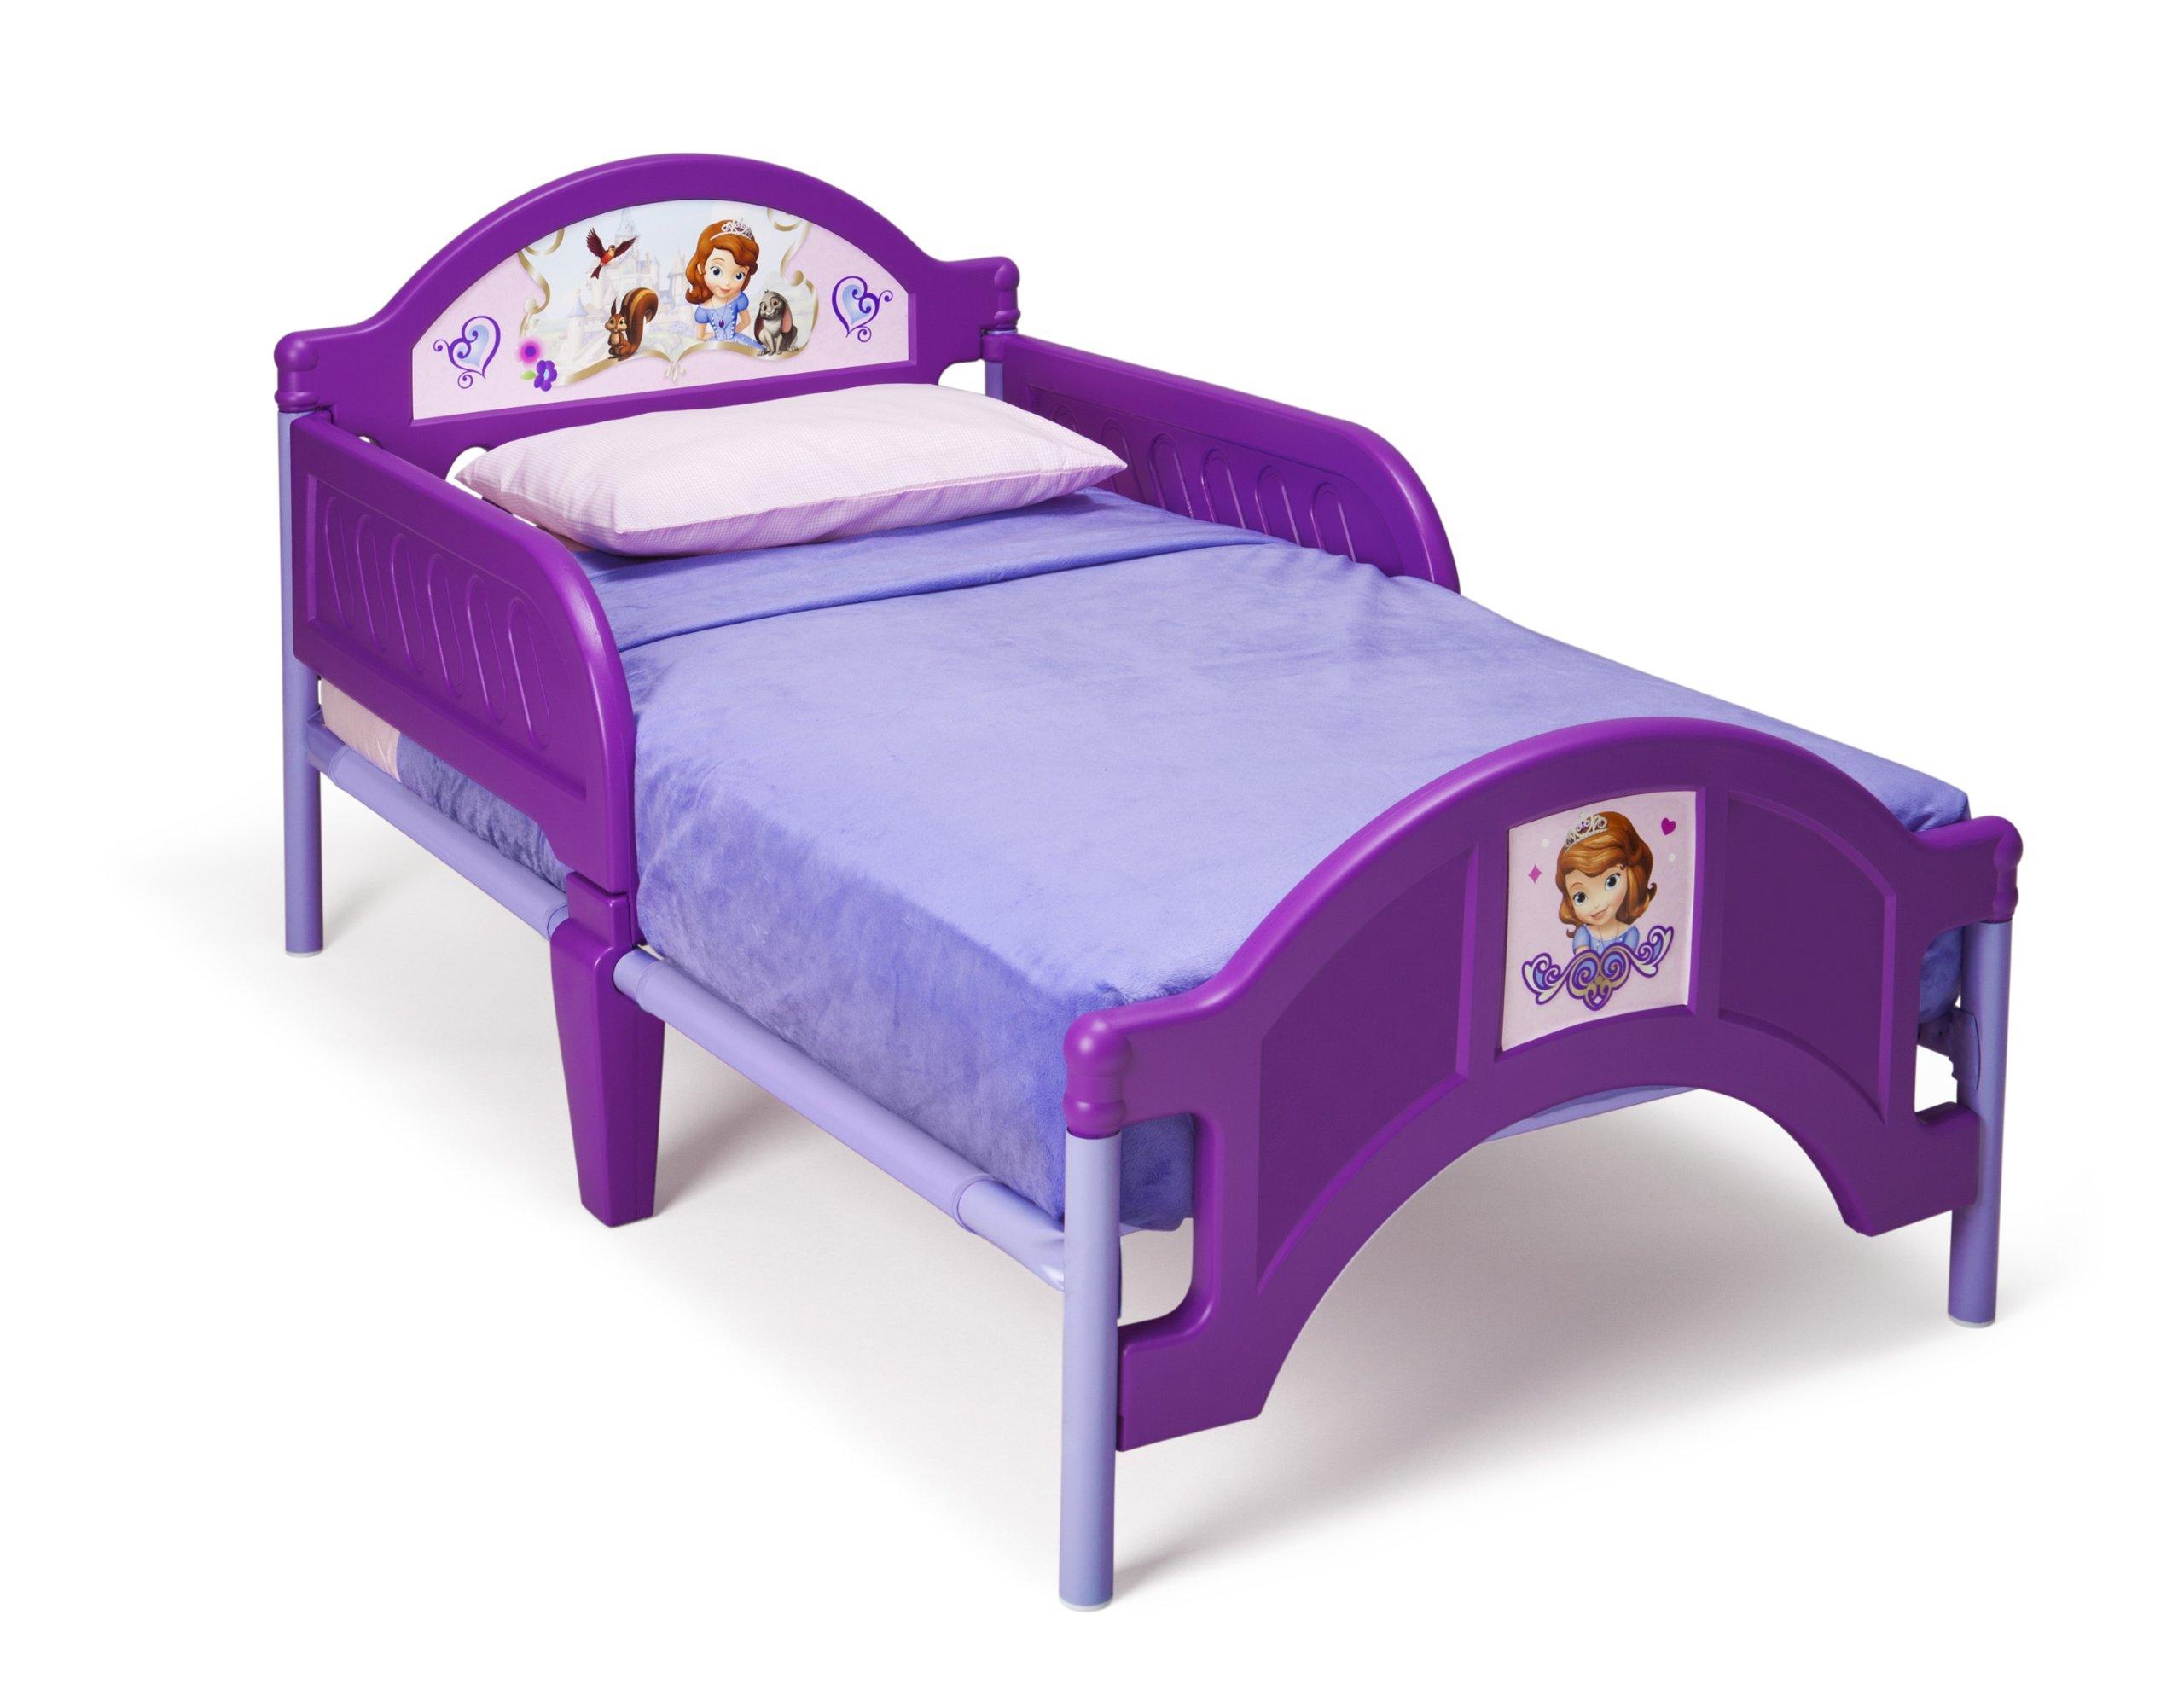 Buy 4 Pieces Kids Disney Sofia The First Toddler Bedding Set Dream